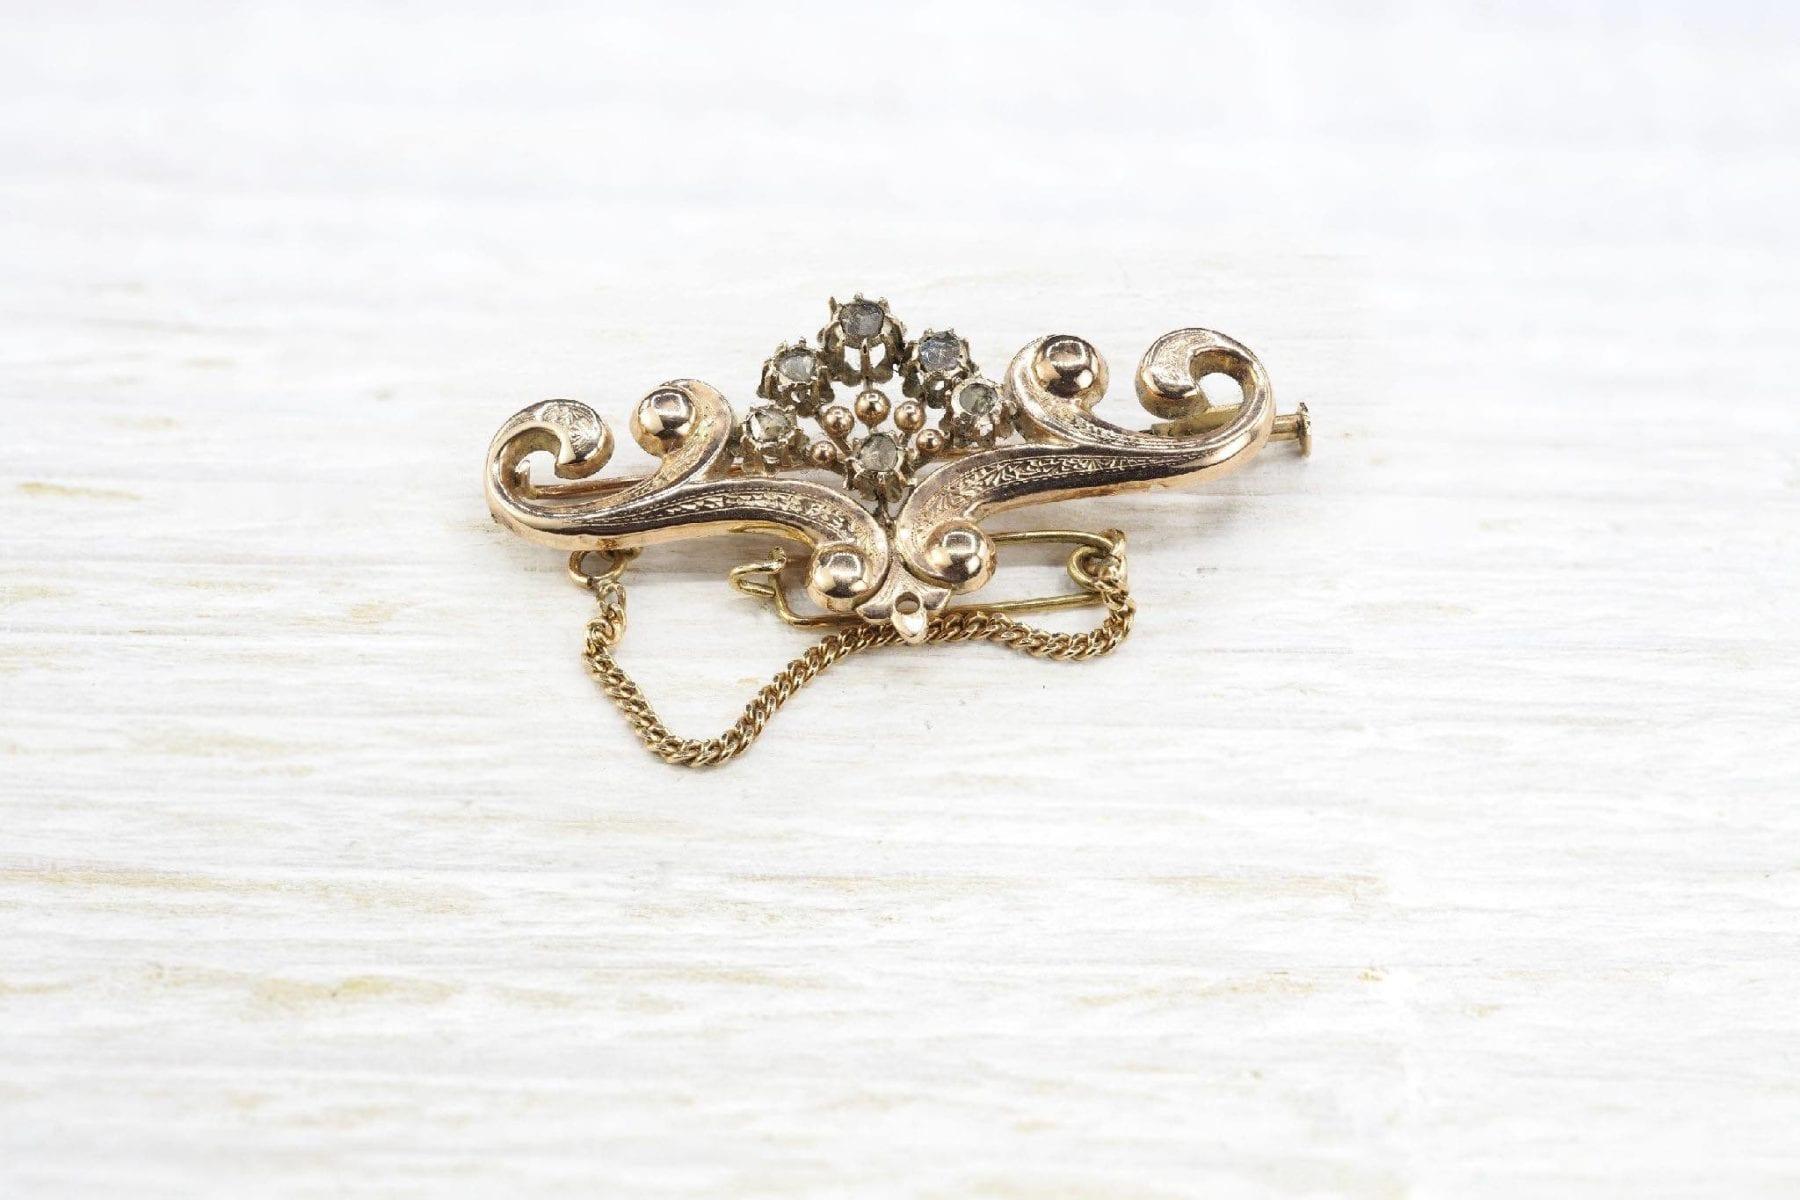 Broche 19e en or sertie de roses de diamant